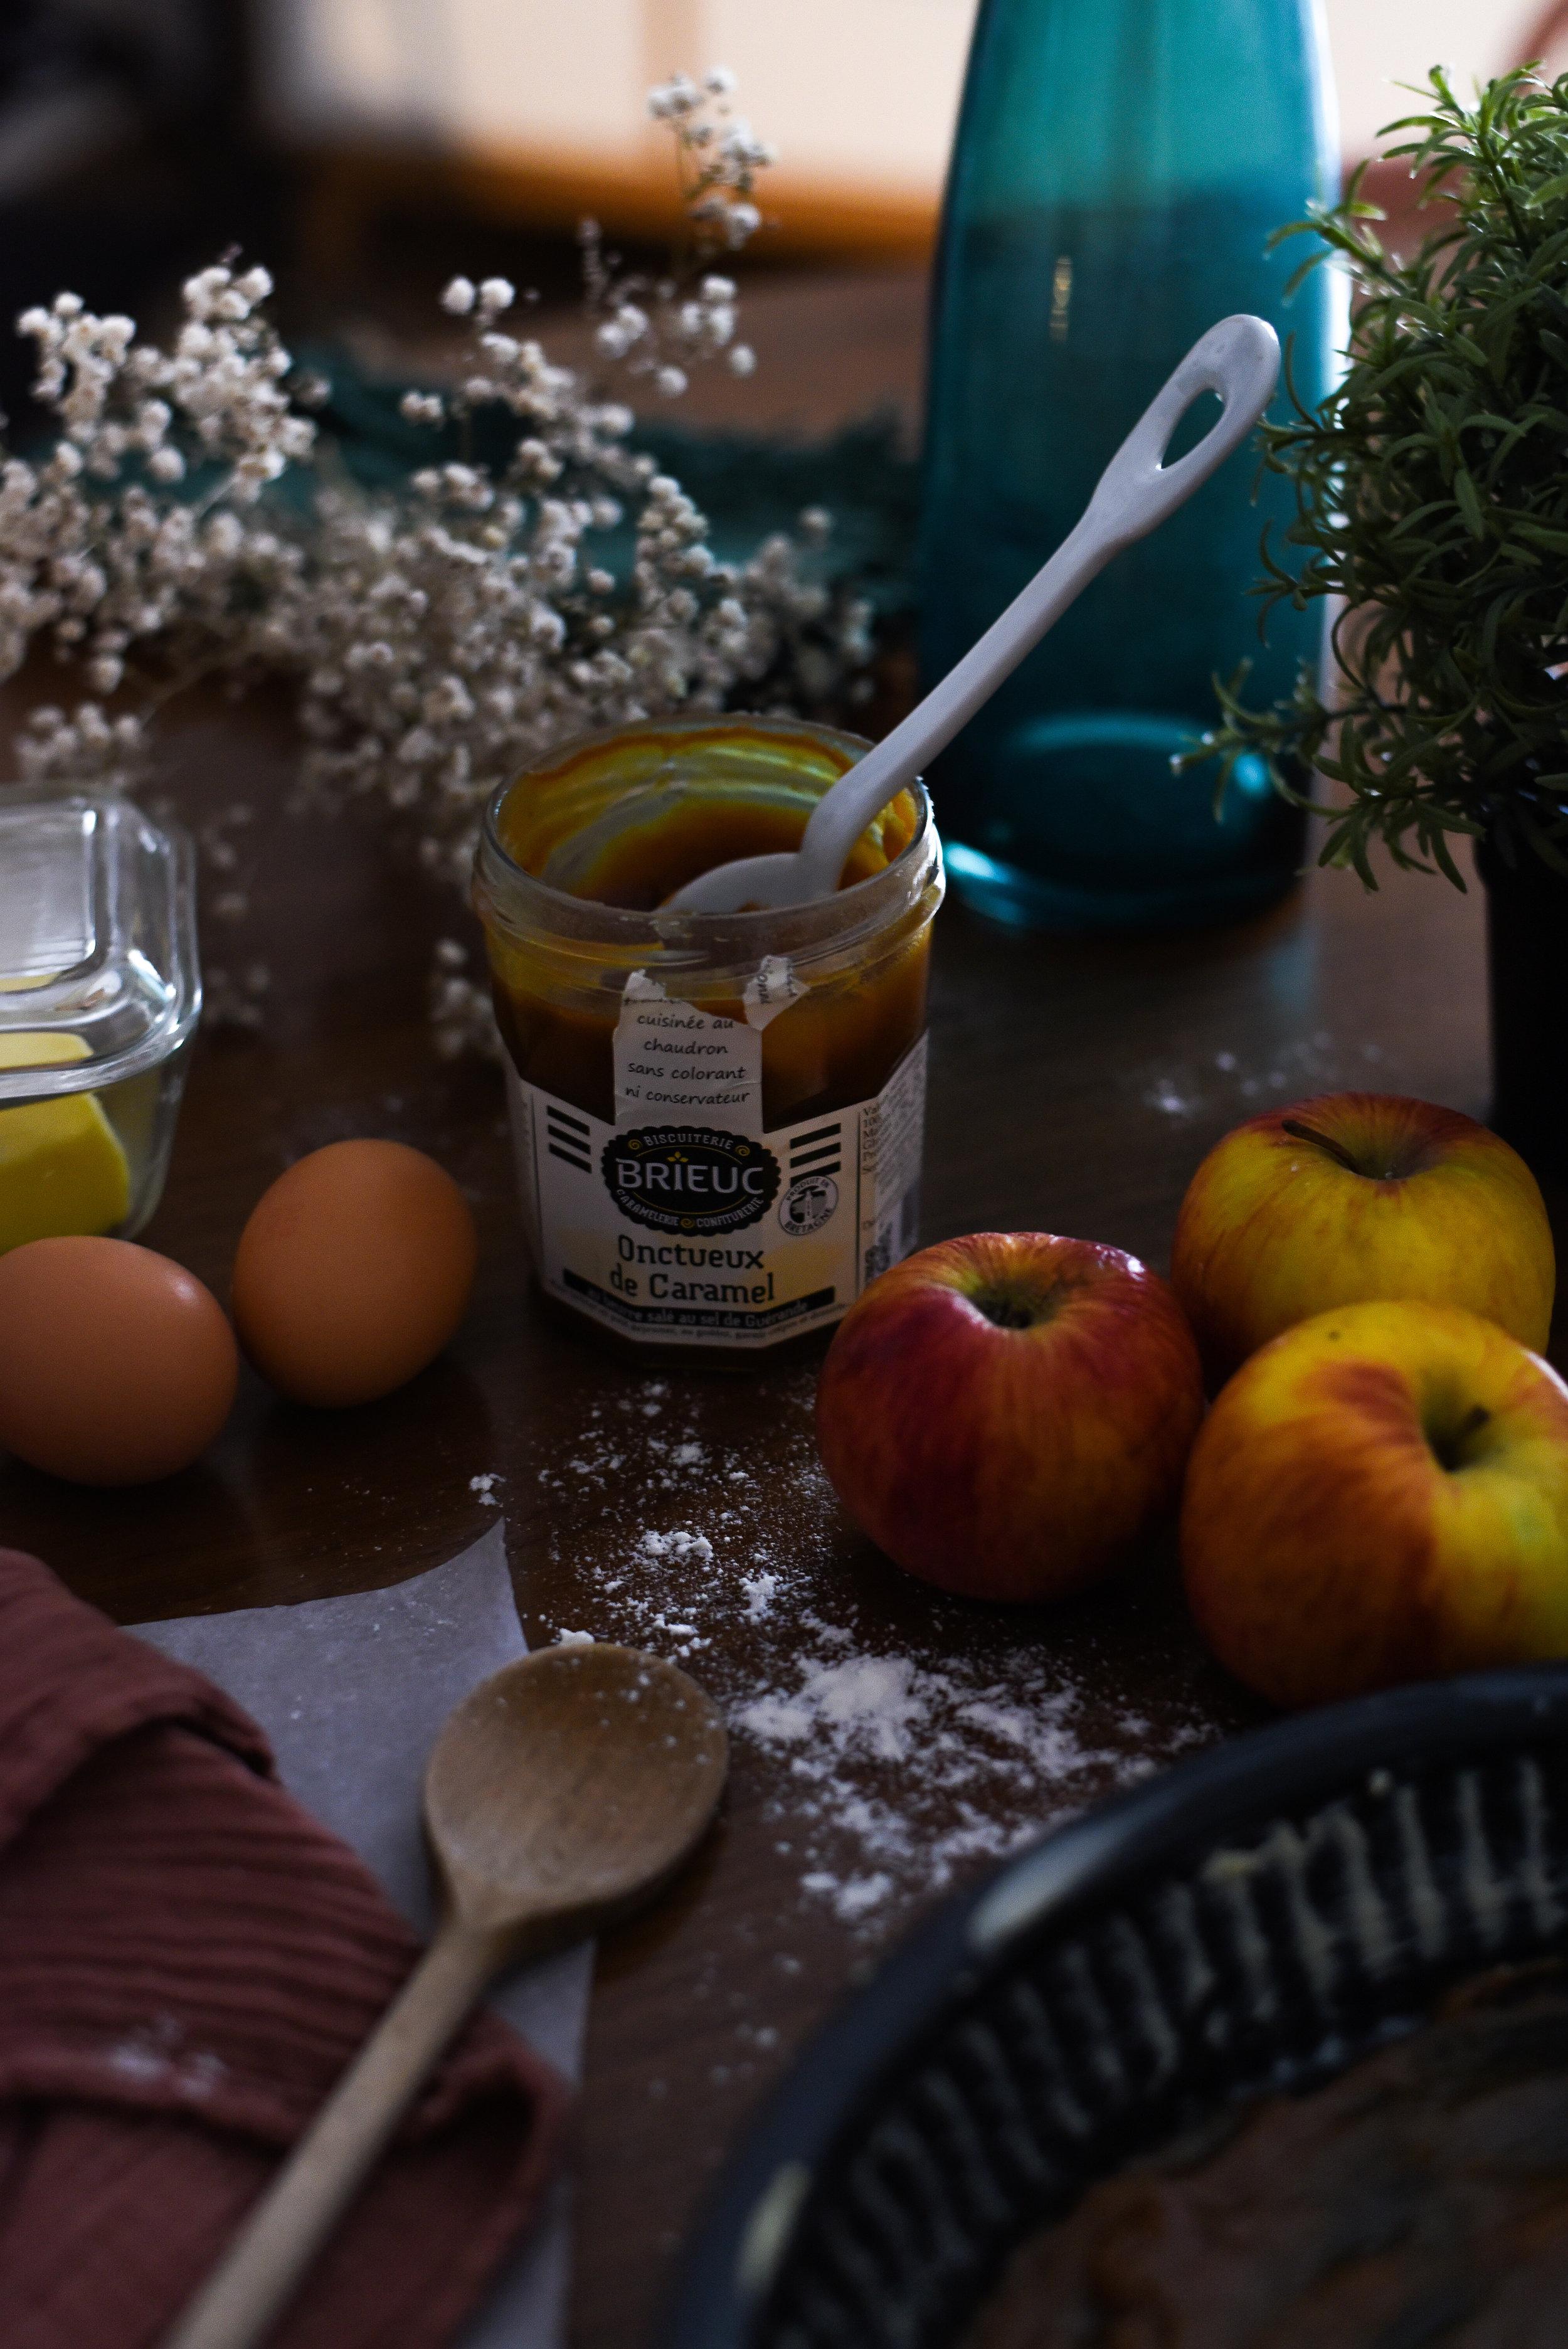 twinky lizzy blog aix en provence - recette gateau pomme caramel beurre sale 02.jpg